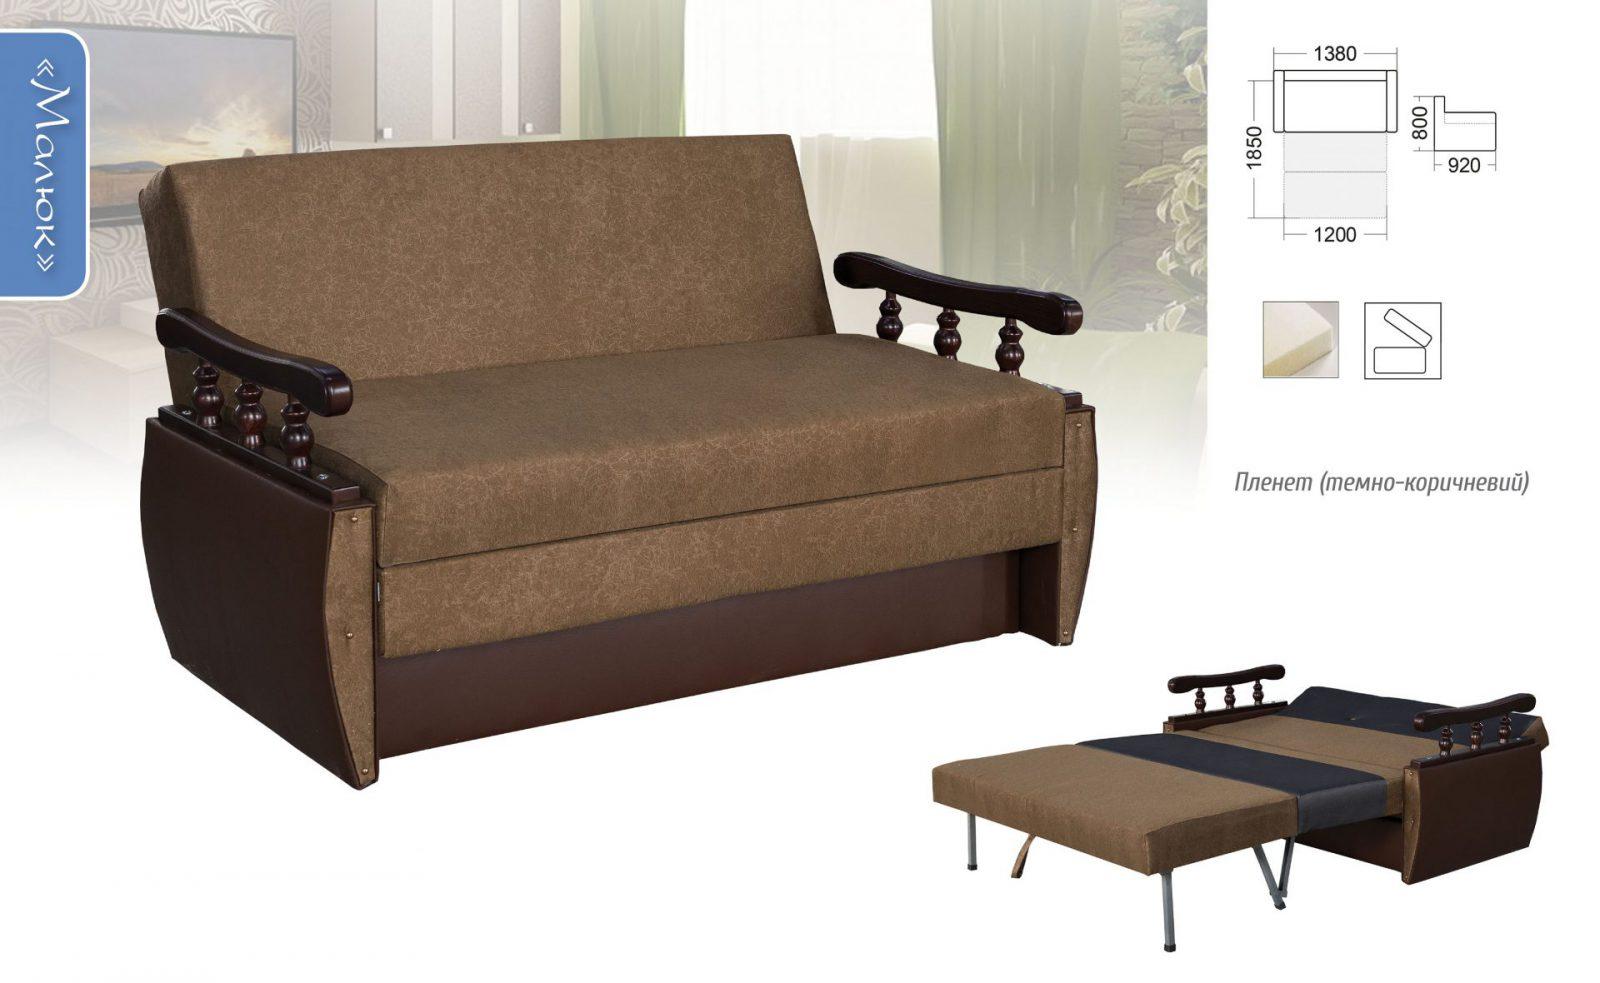 диван малюк 1200 пленет мебель сервис